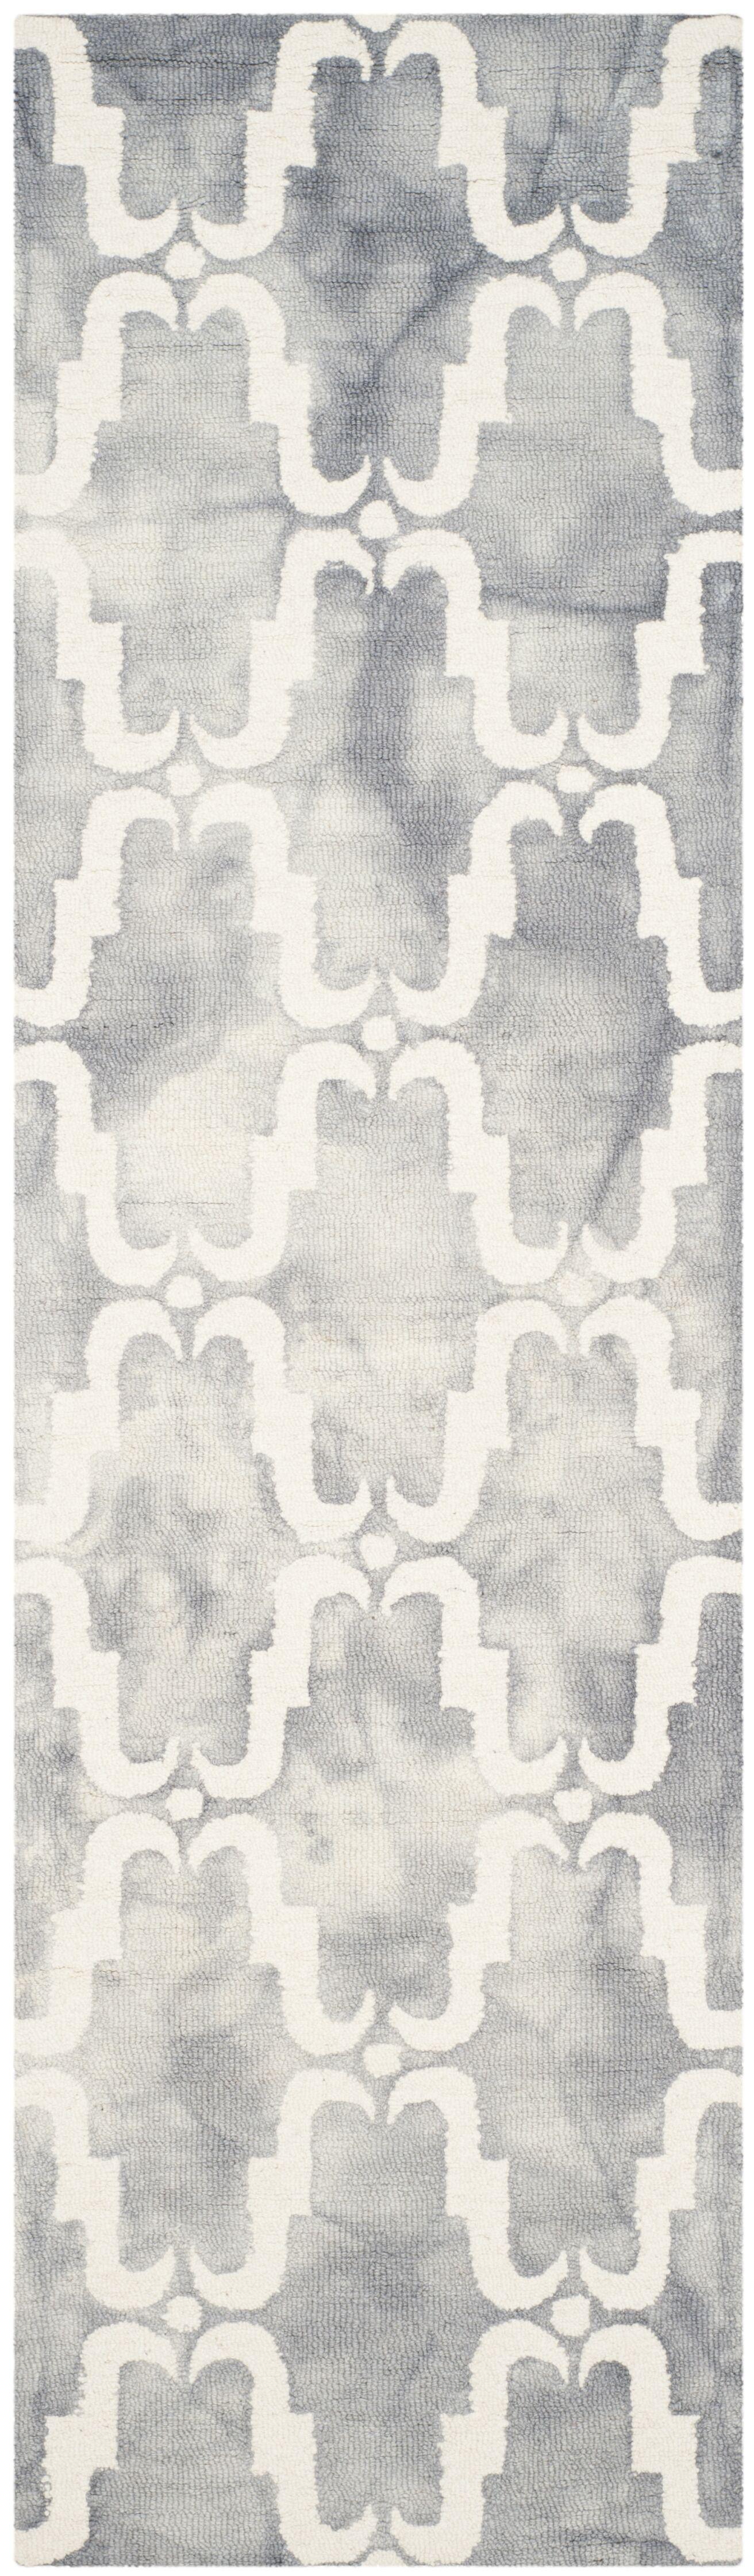 Hand-Tufted Dip Dye Gray/Ivory Area Rug Rug Size: Runner 2'3